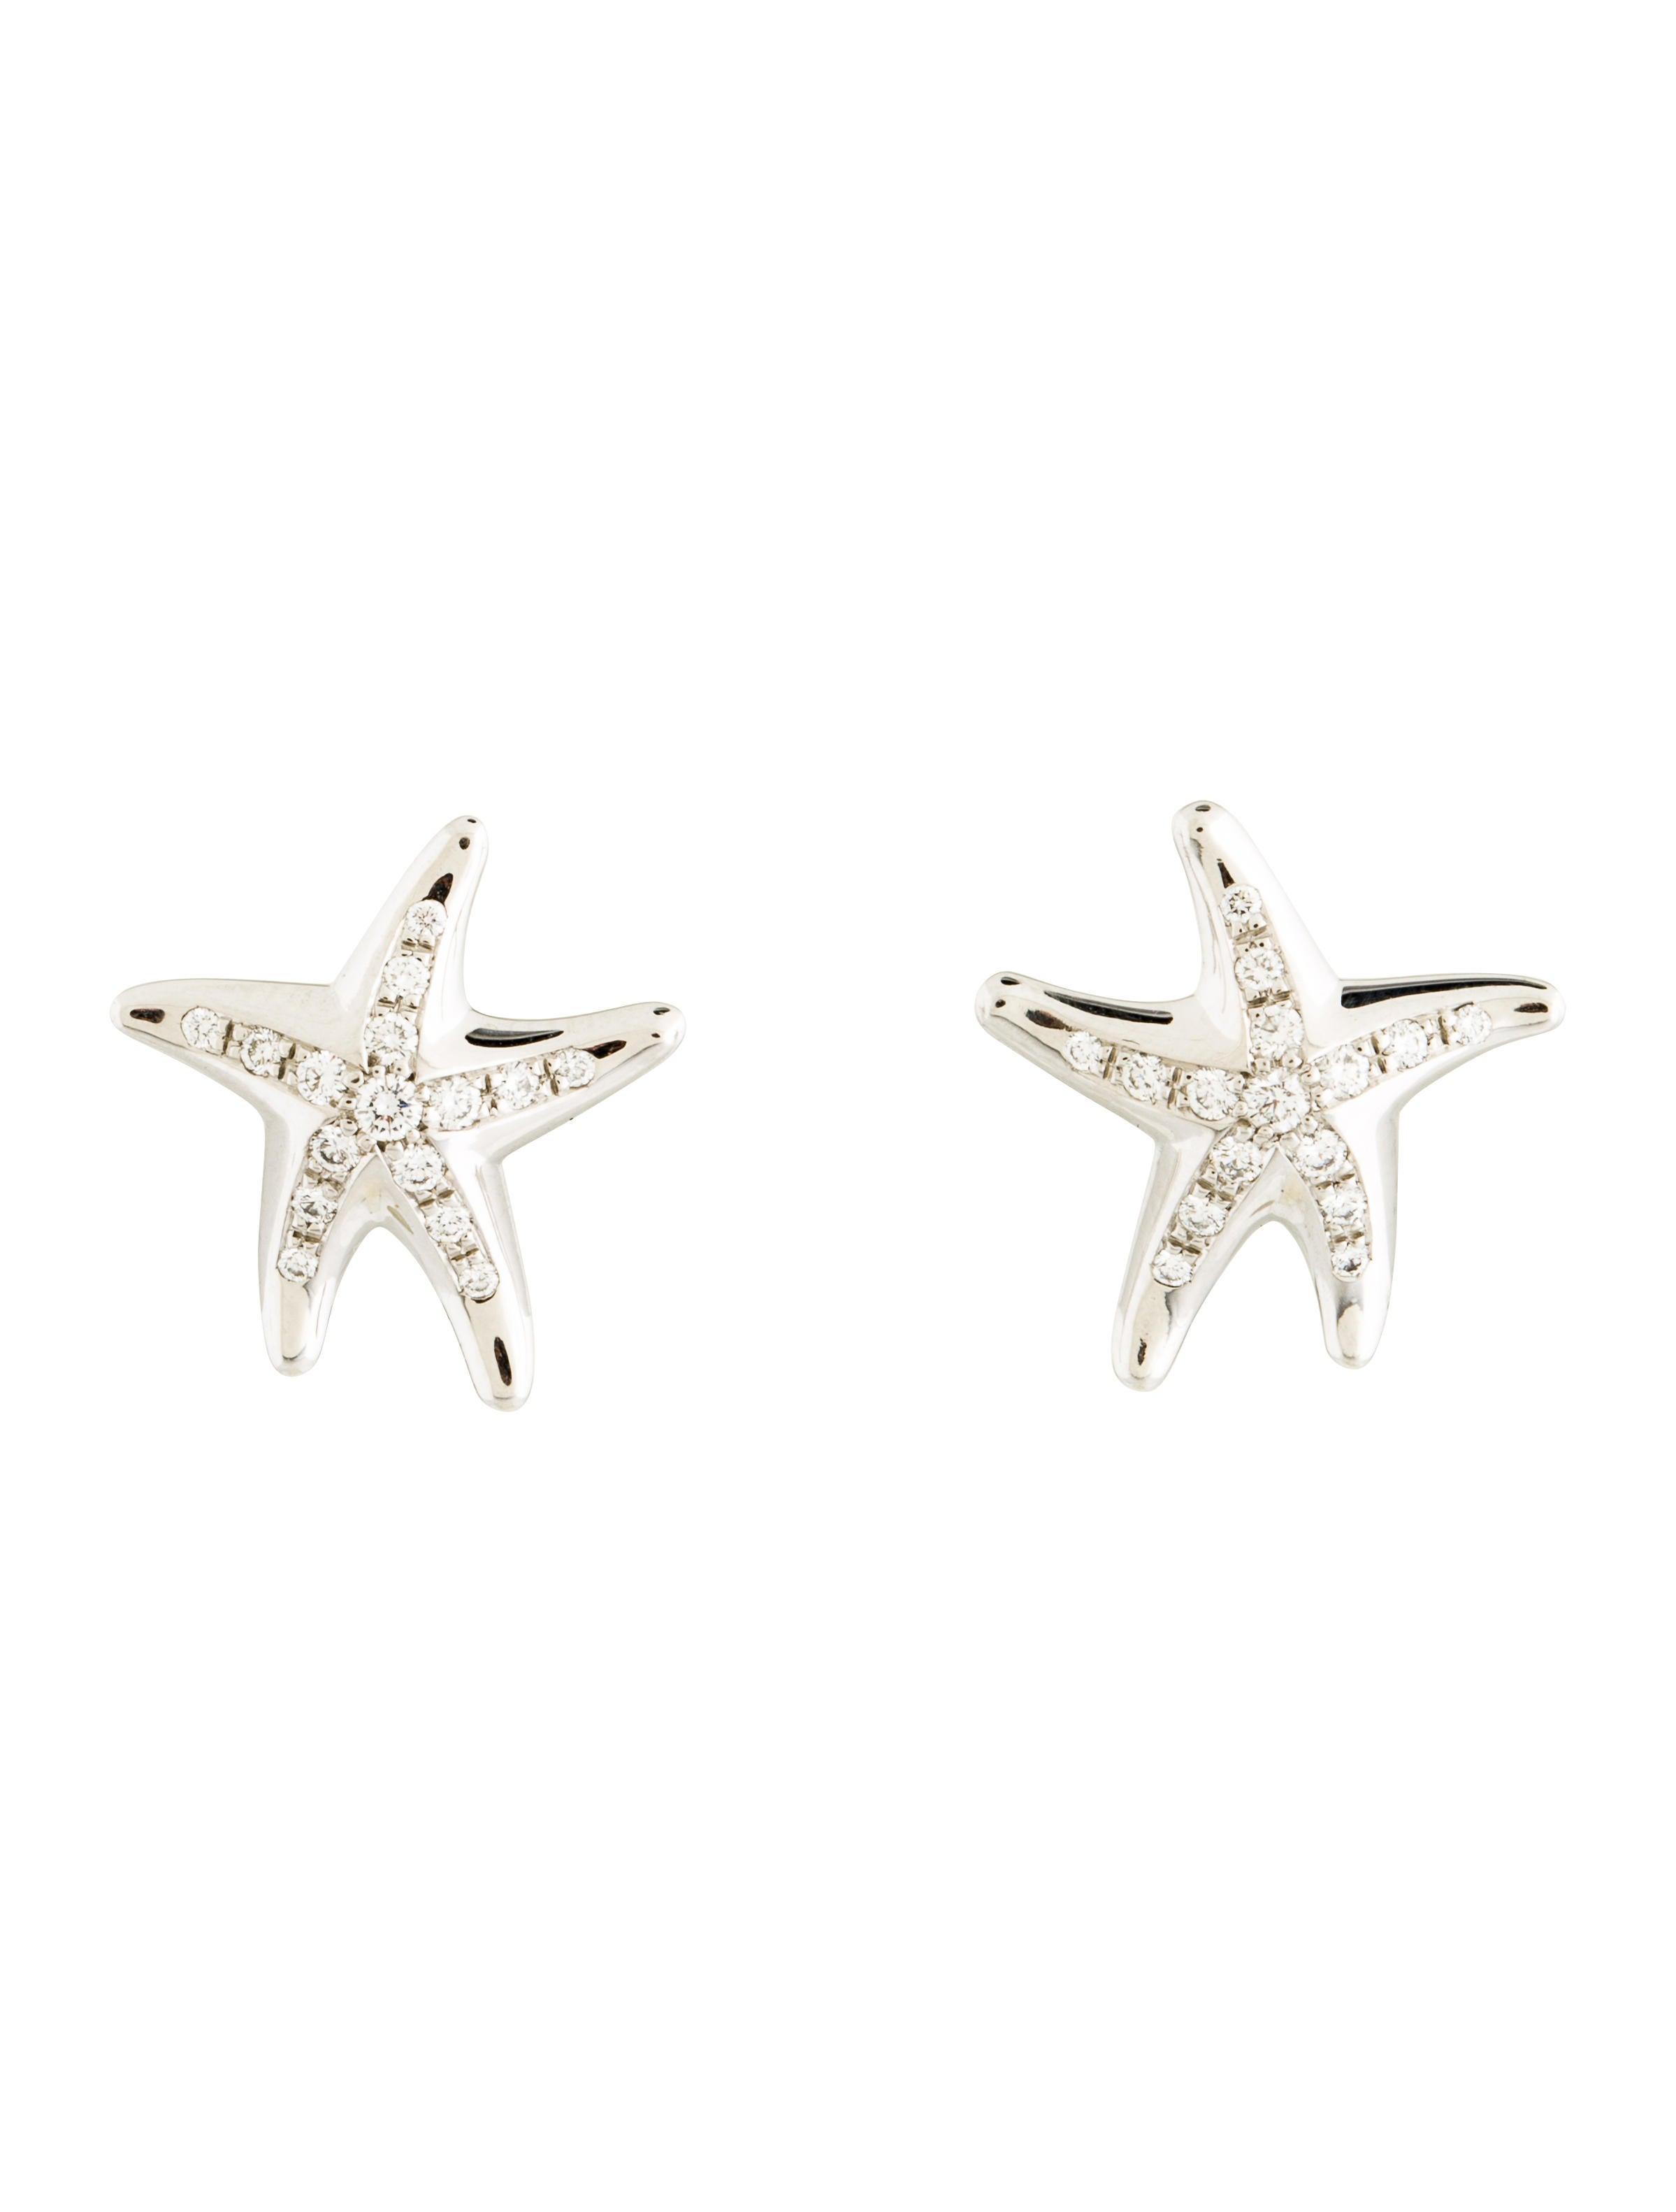 Tiffany & Co Platinum Diamond Starfish Earrings Earrings